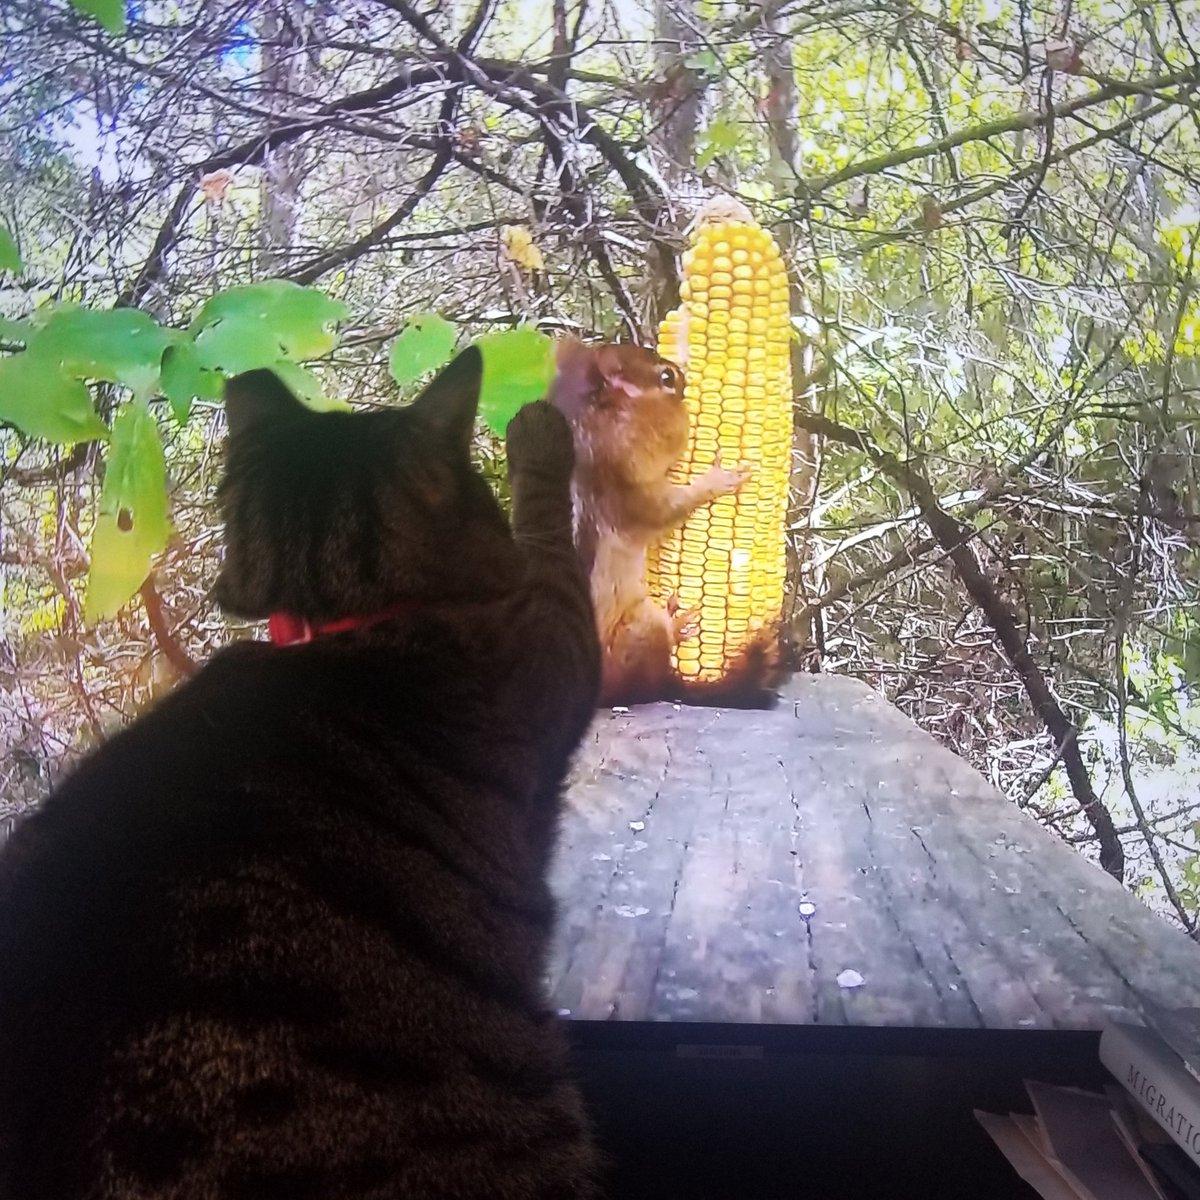 T V for cats on Amazon  Mitsy enjoyed it! #Caturday  #Amazon